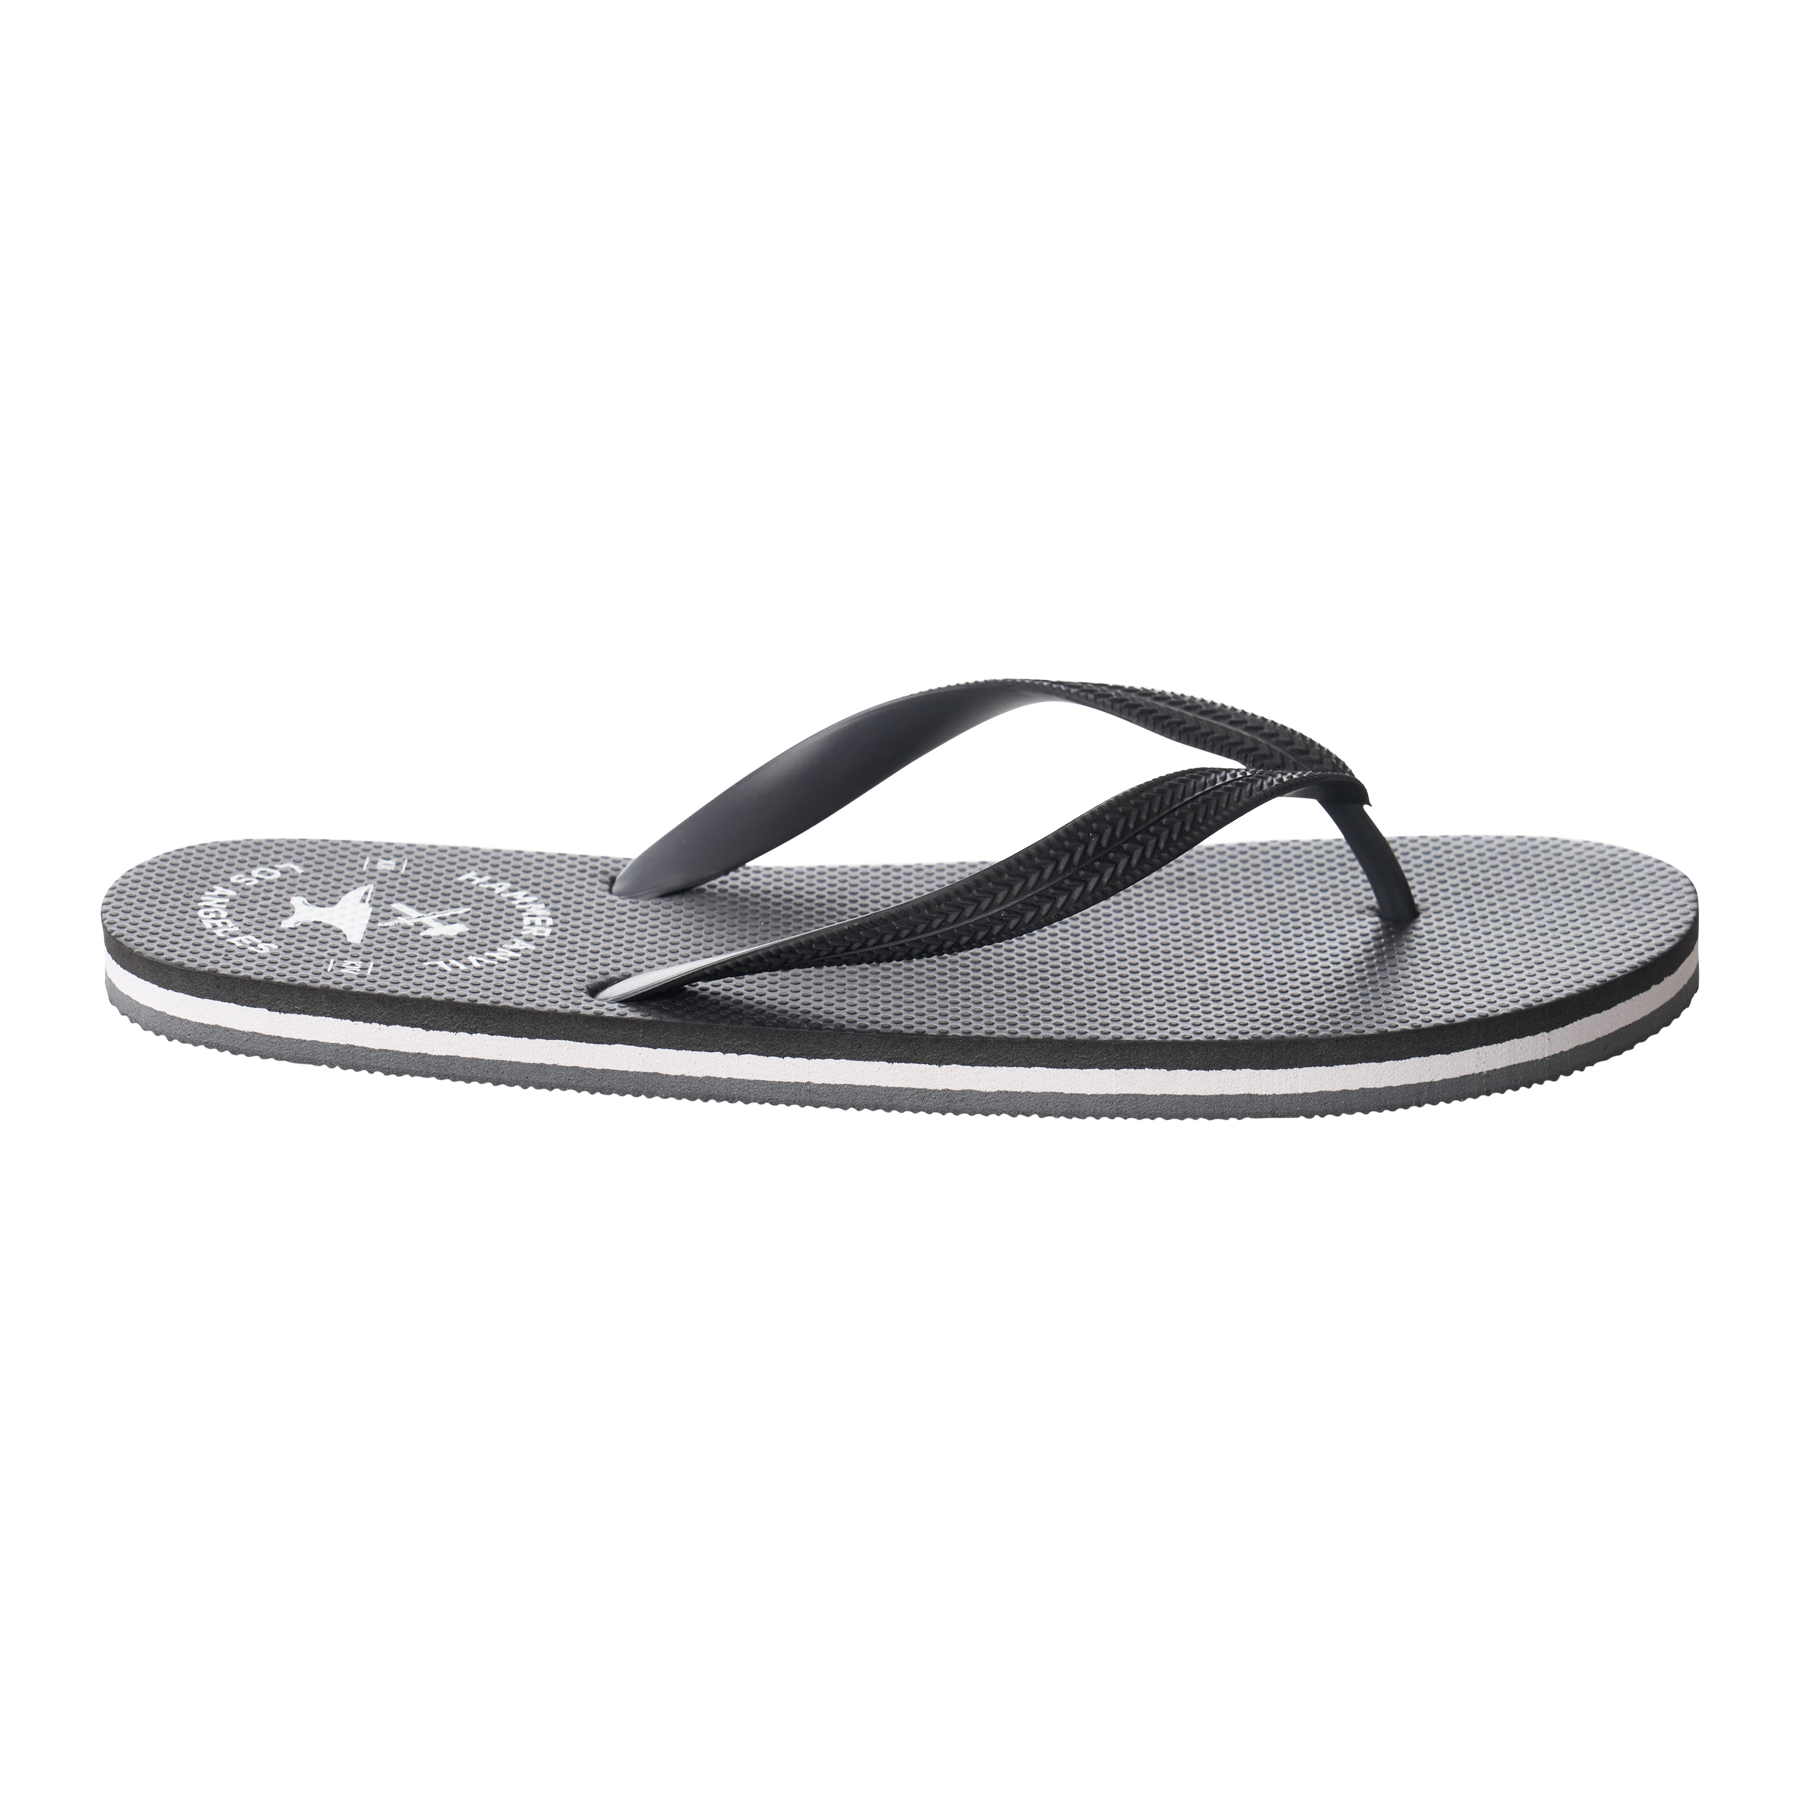 Hammer-Anvil-Mens-Flip-Flops-Casual-Thong-Summer-Sandals-Comfortable-Beach-Shoes thumbnail 17